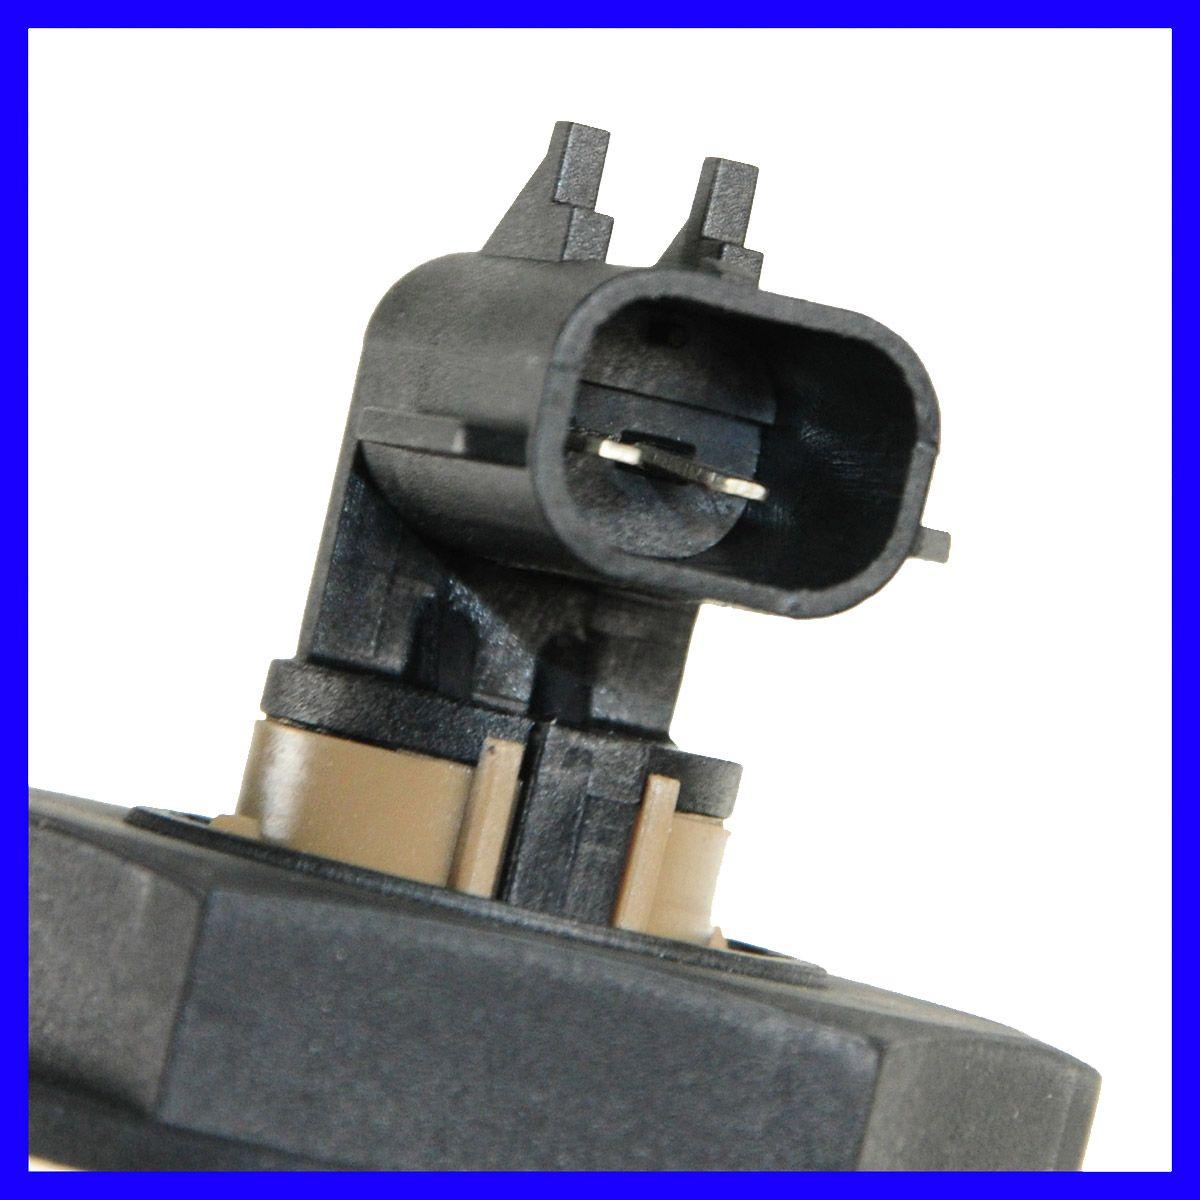 For Freightliner Columbia Engine Coolant Level Sensor 2008-2010 Dorman 924-5205